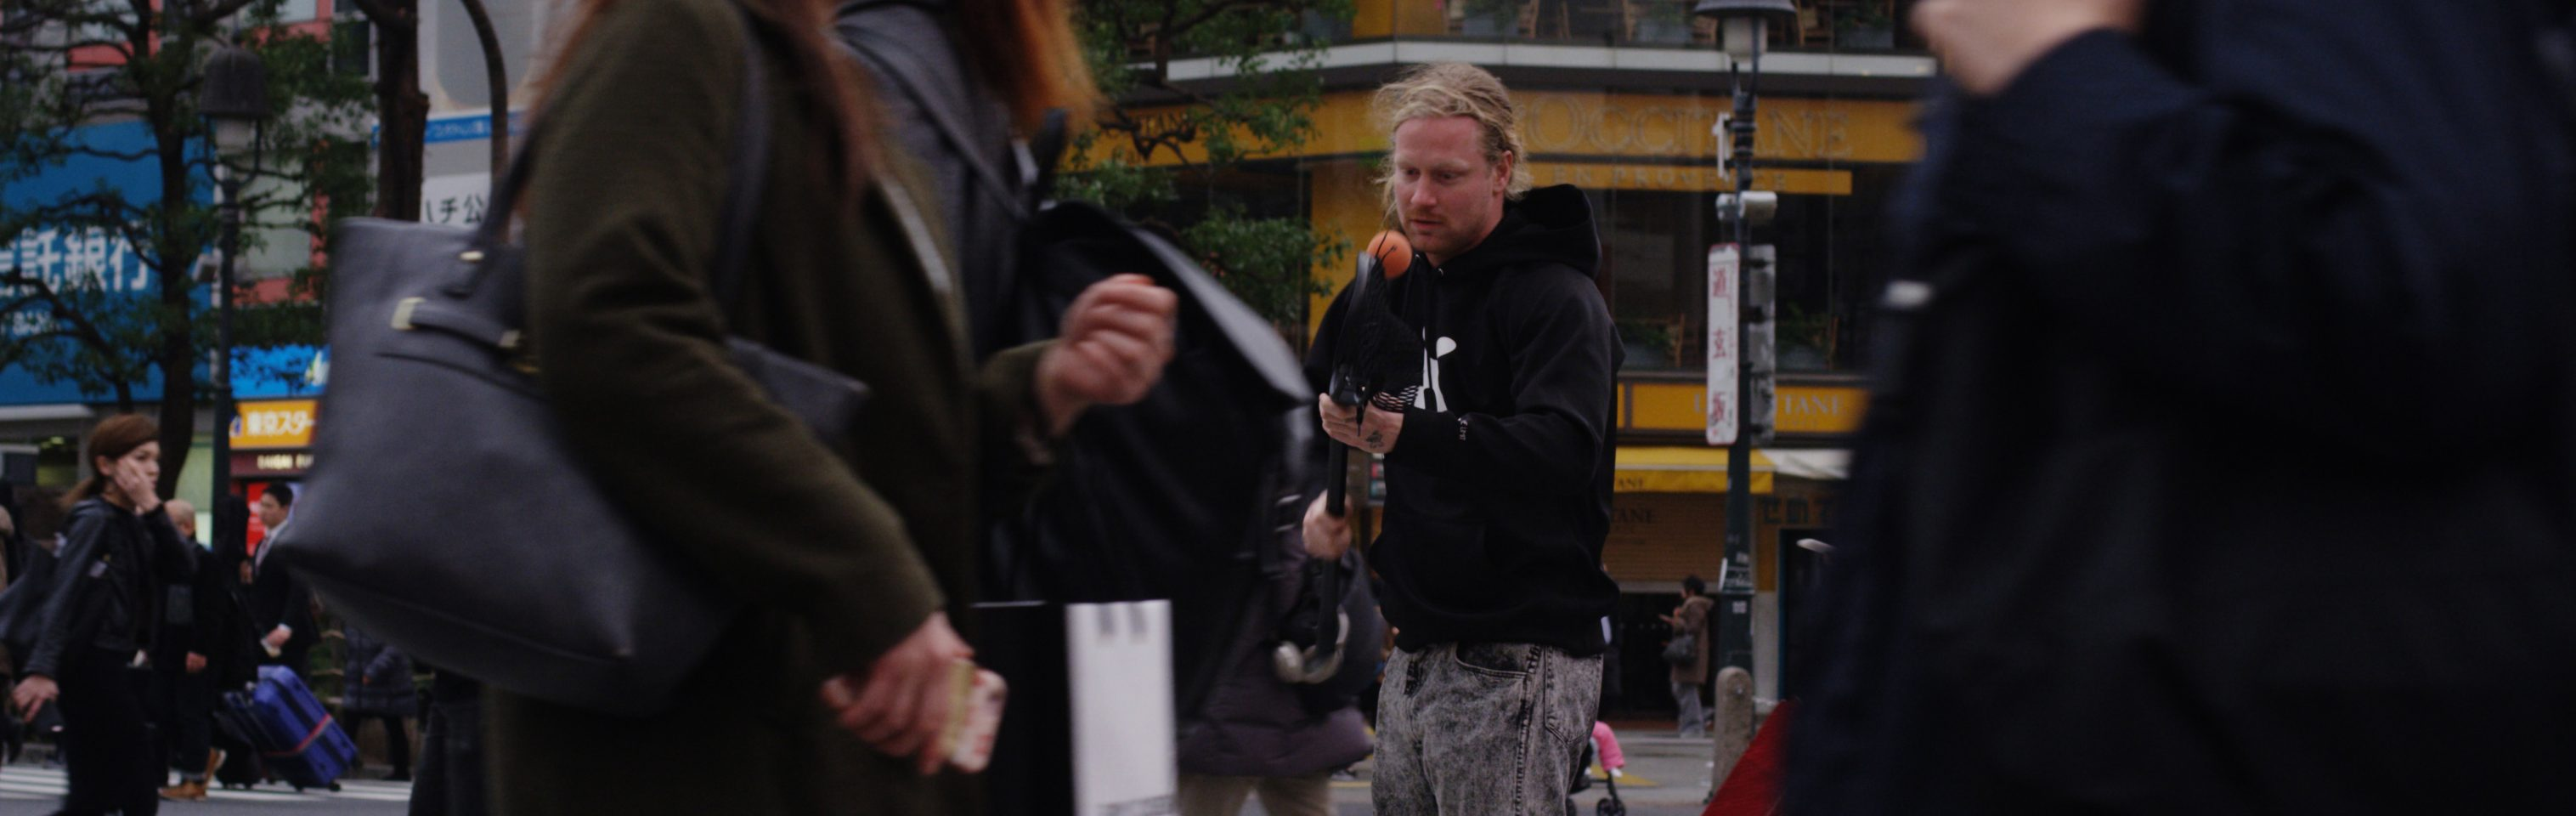 StringKing Pro Lacrosse Player Matt Gibson Coaching in Japan Arigato Series